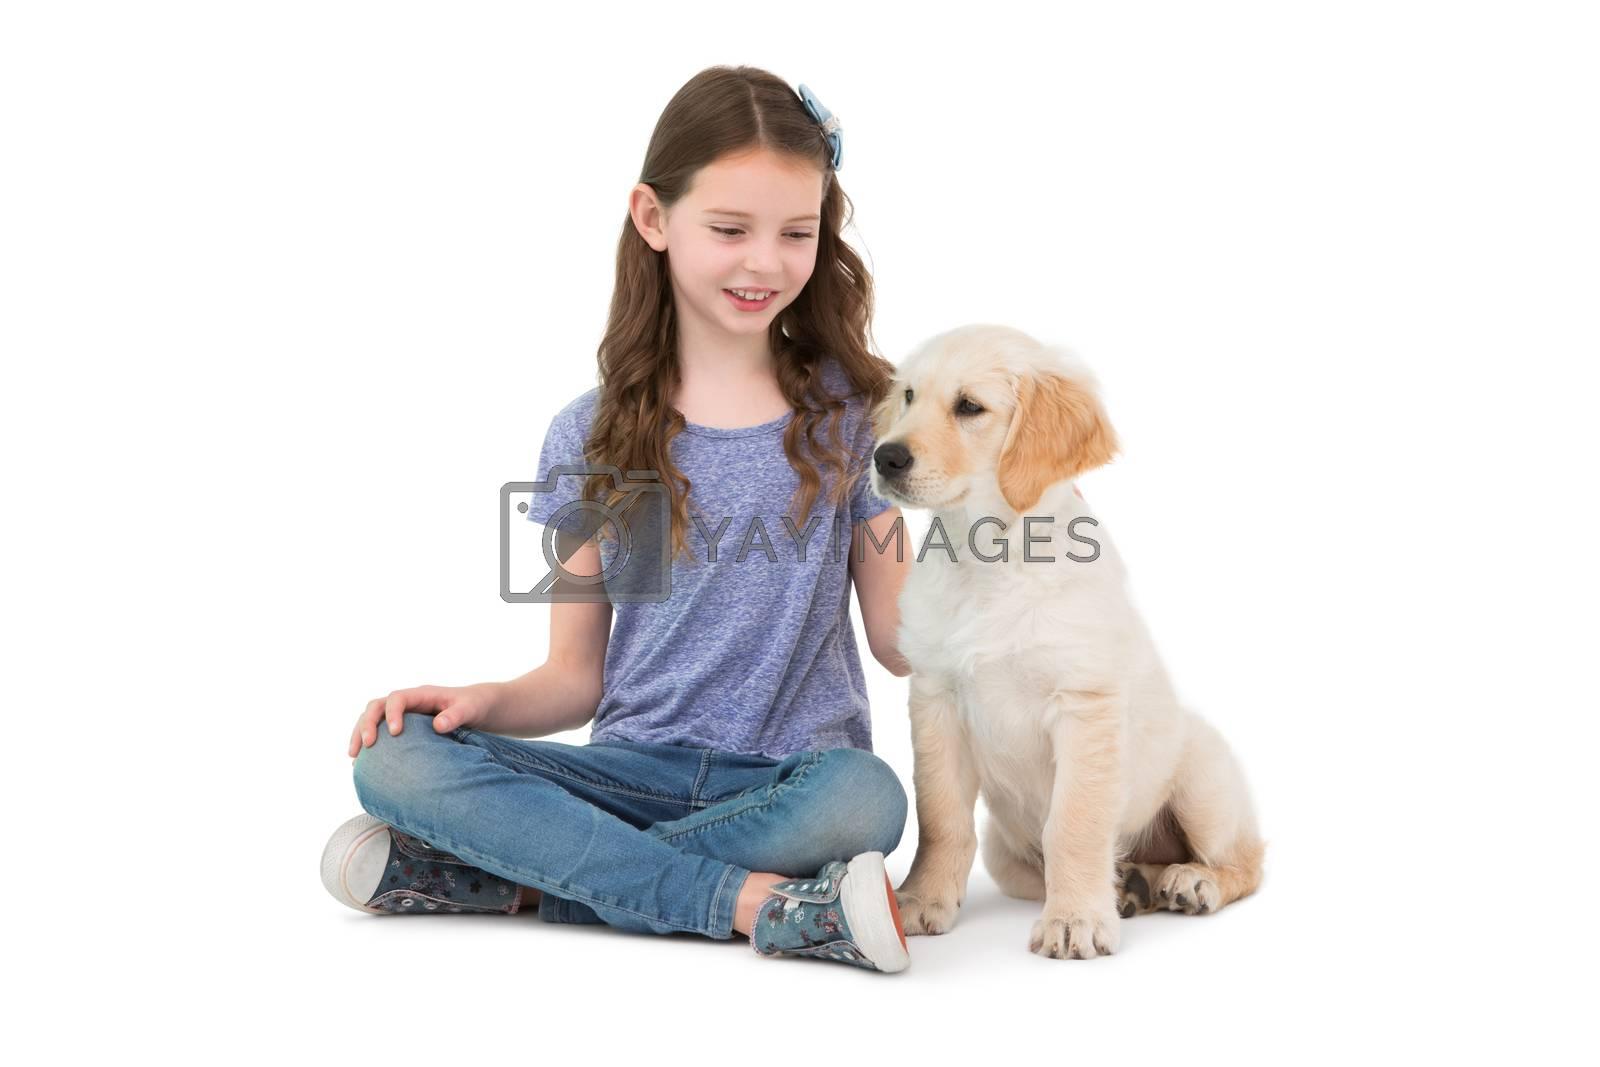 Smiling little girls sitting next to dog on white background